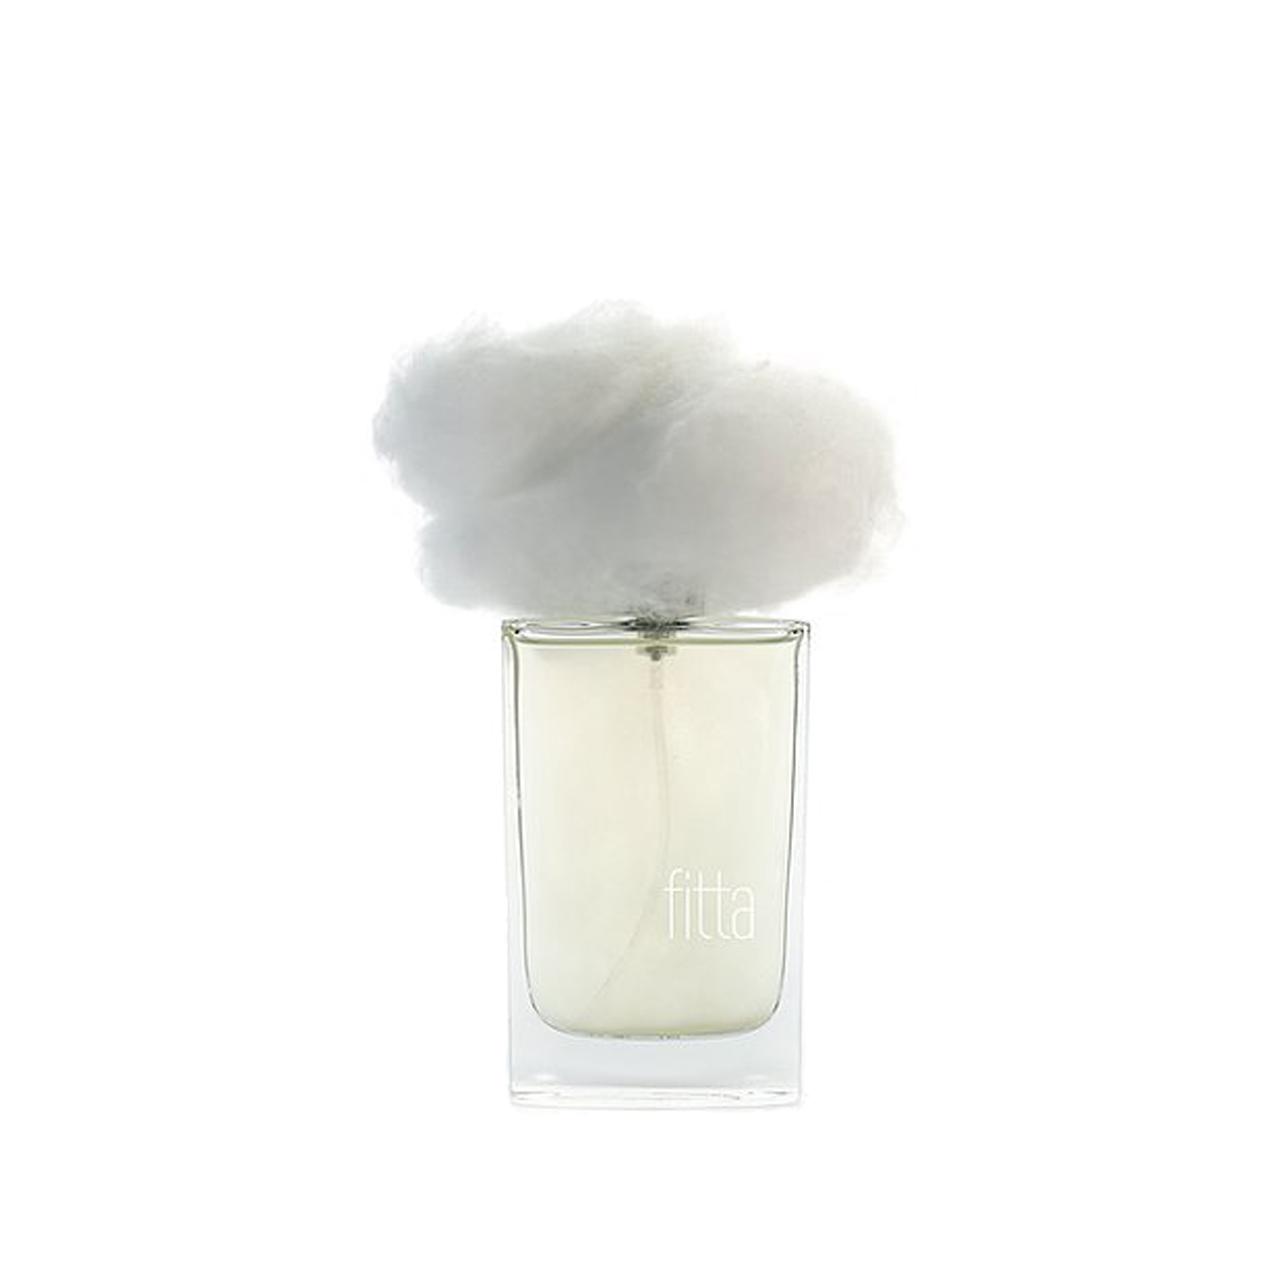 Nebbia Fitta - Extrait de Parfum